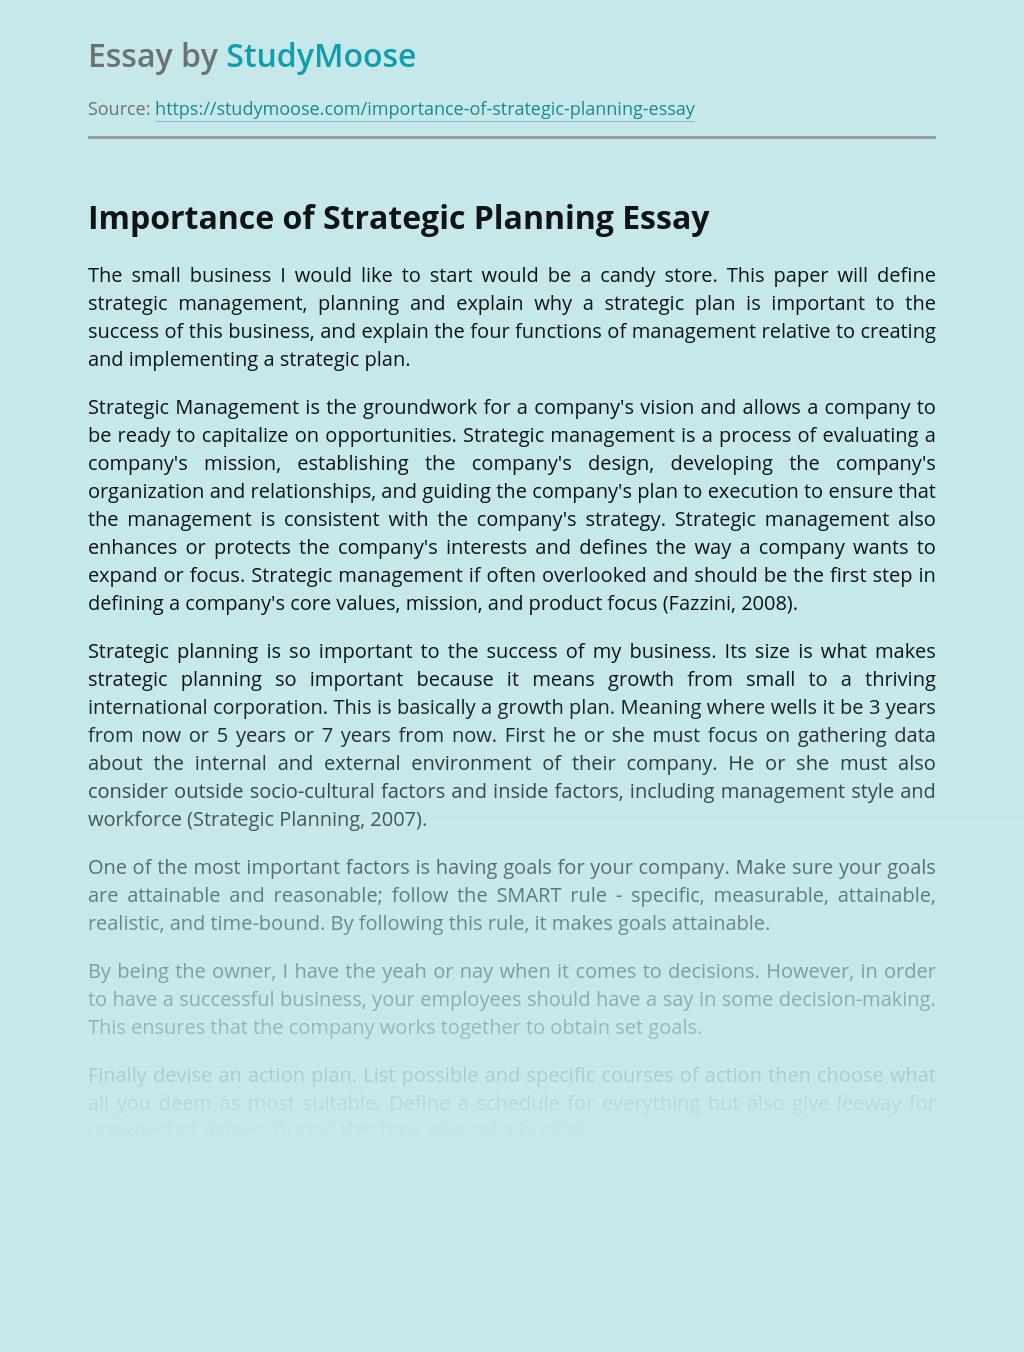 Importance of Strategic Planning